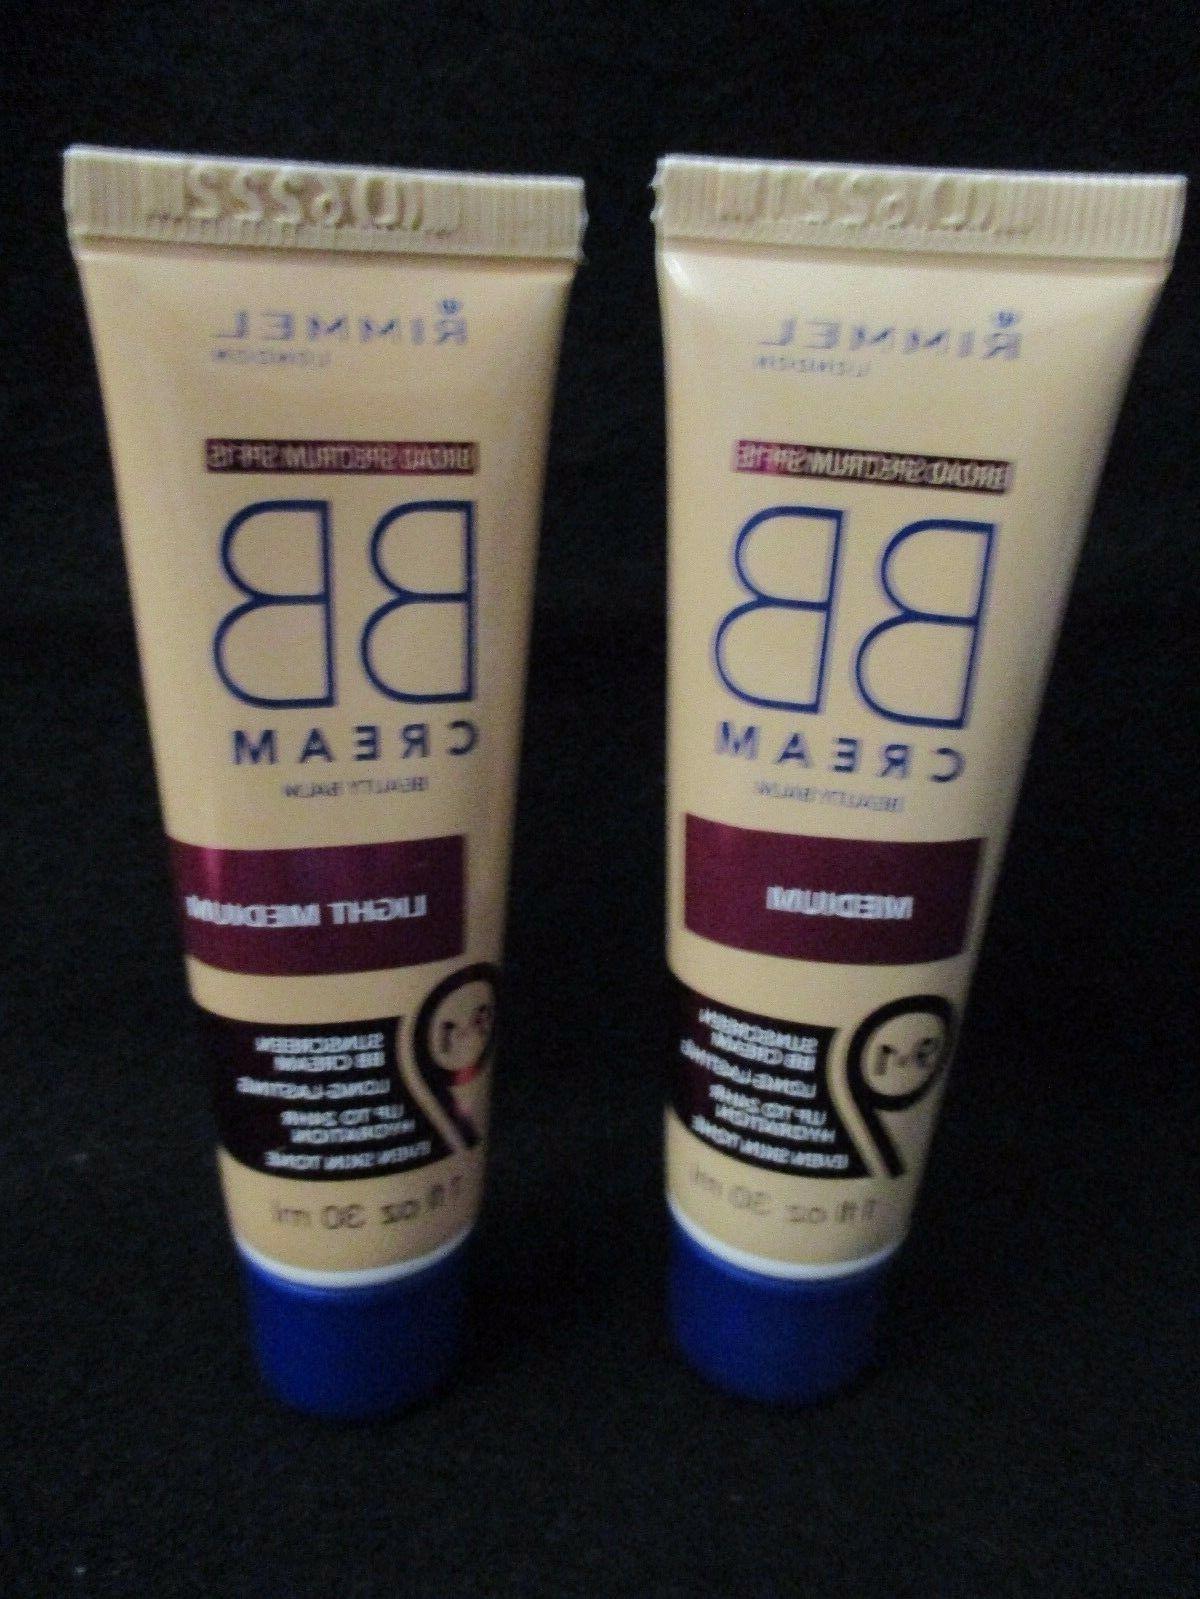 Rimmel London BB Cream Beauty Balm-Skin Profecting Mattifies